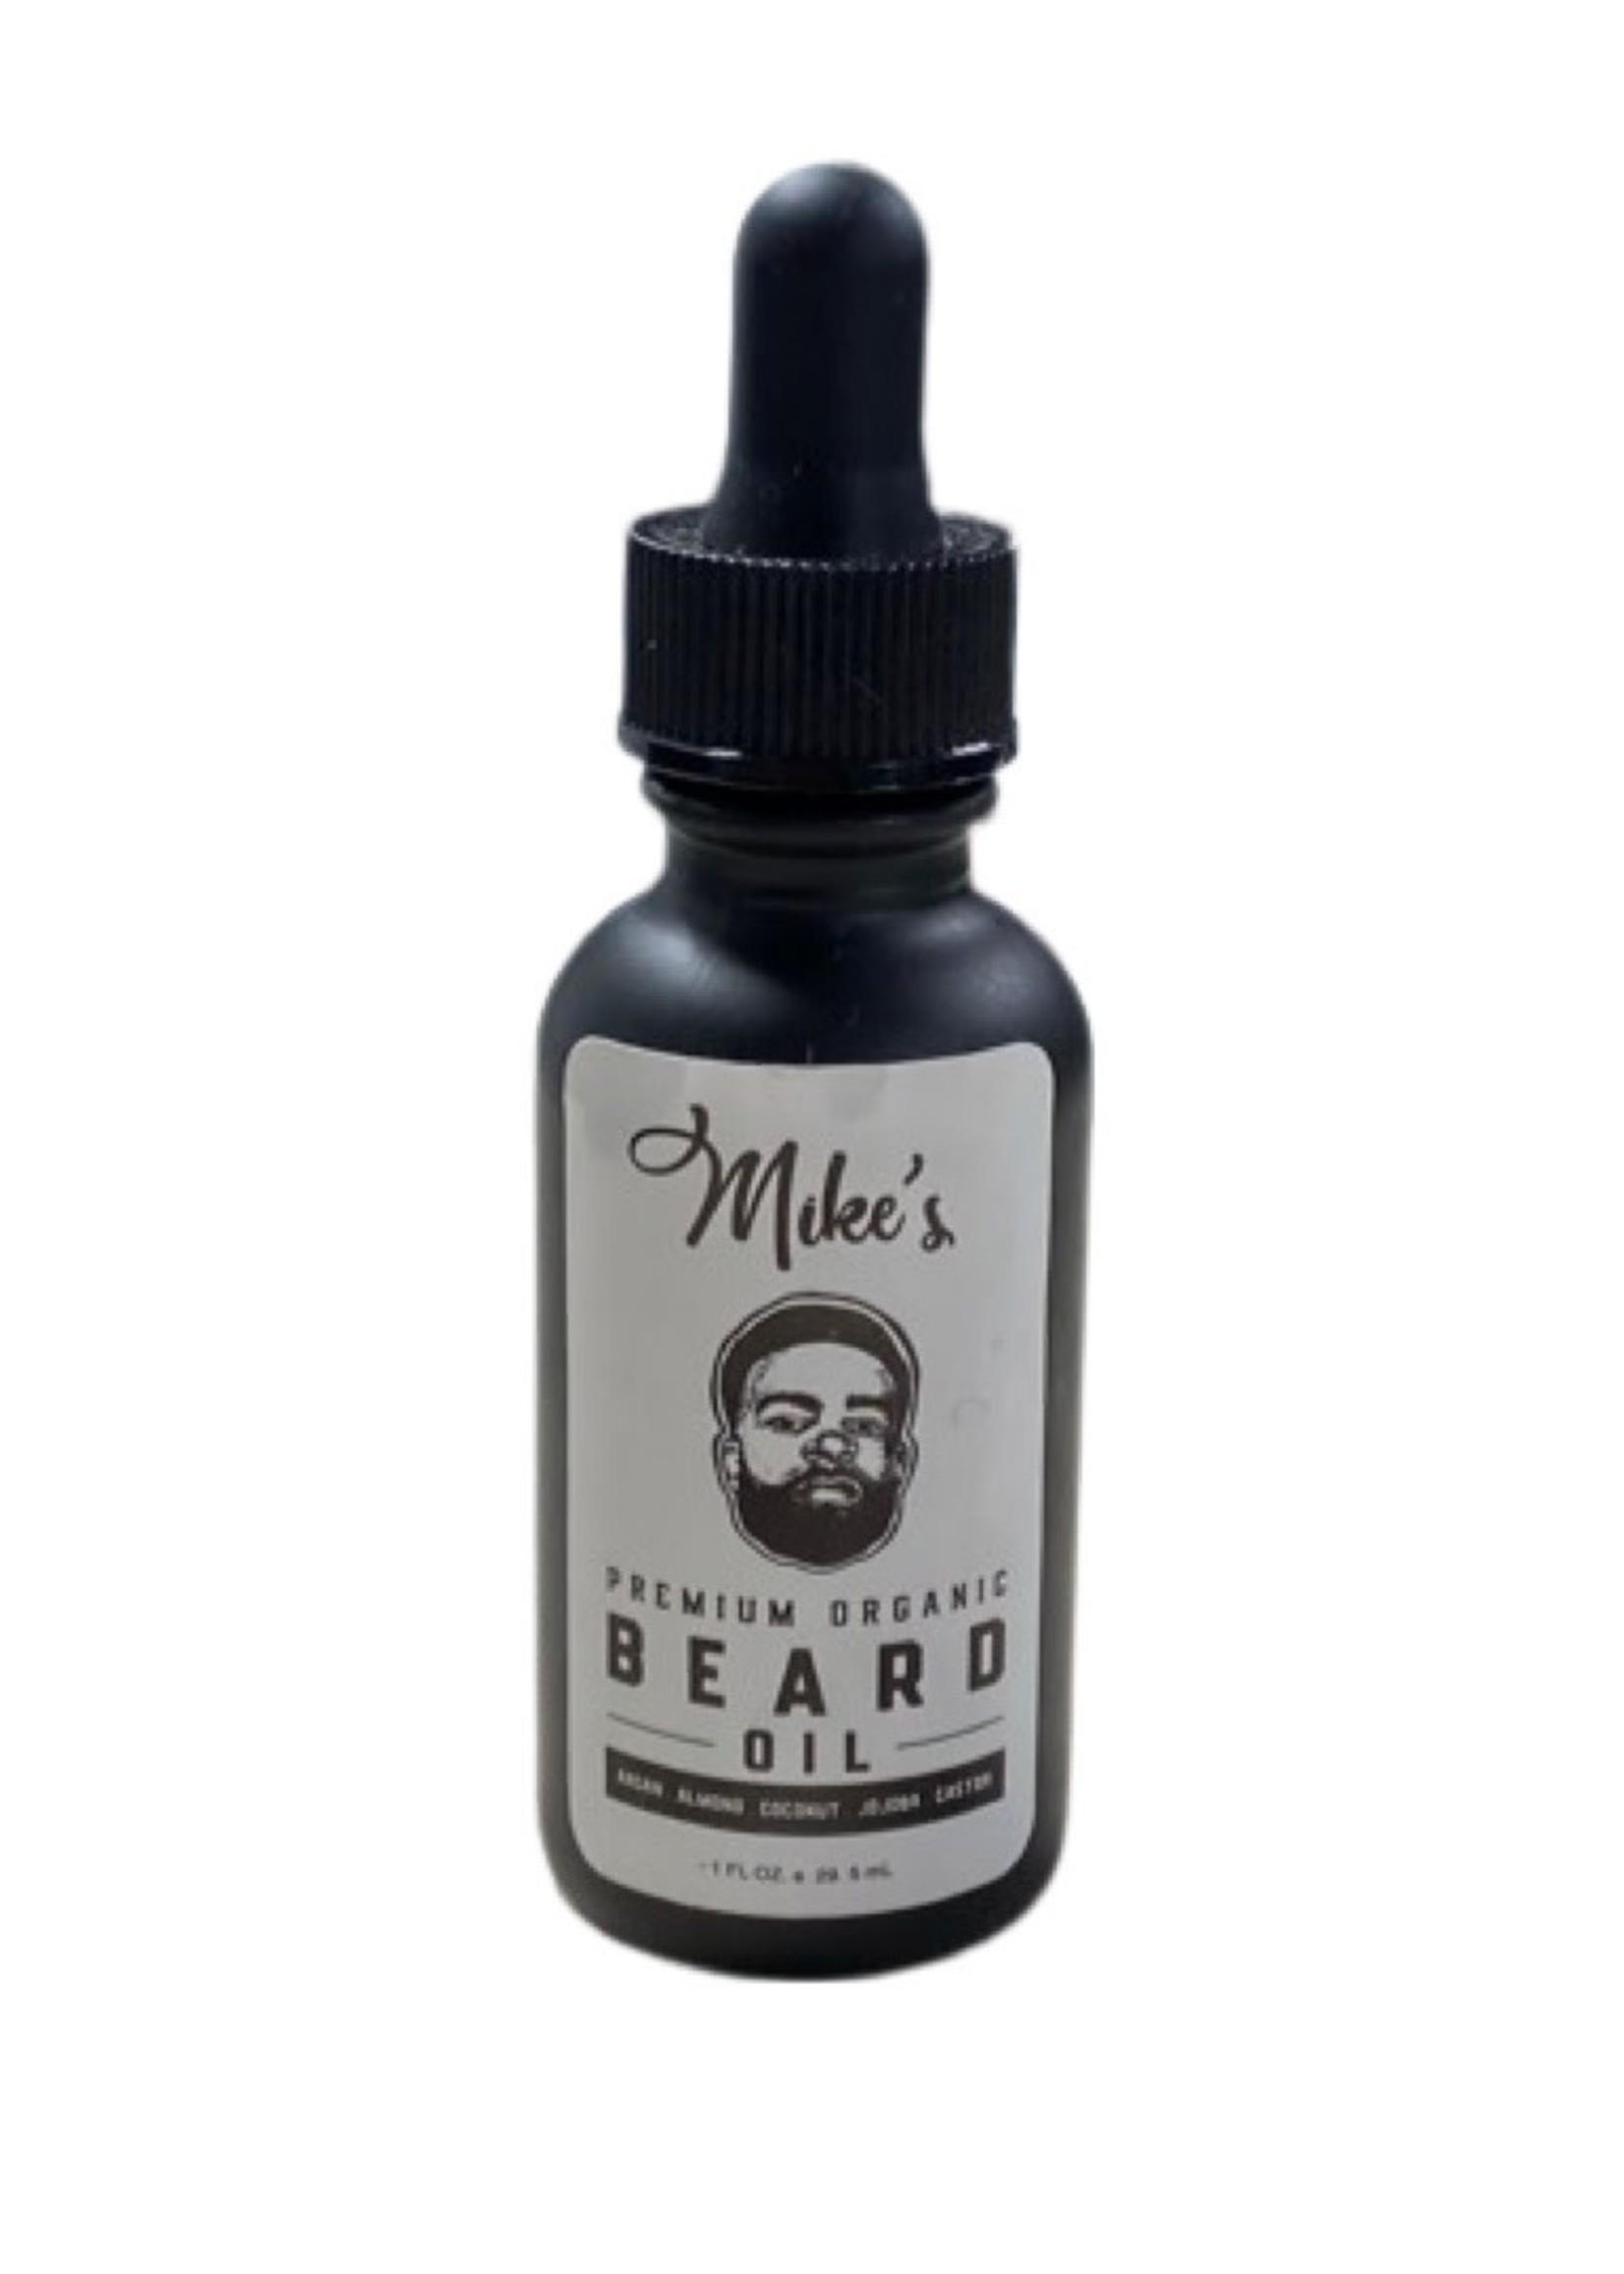 Mike's Premium Organic Beard Oil-  Original scent